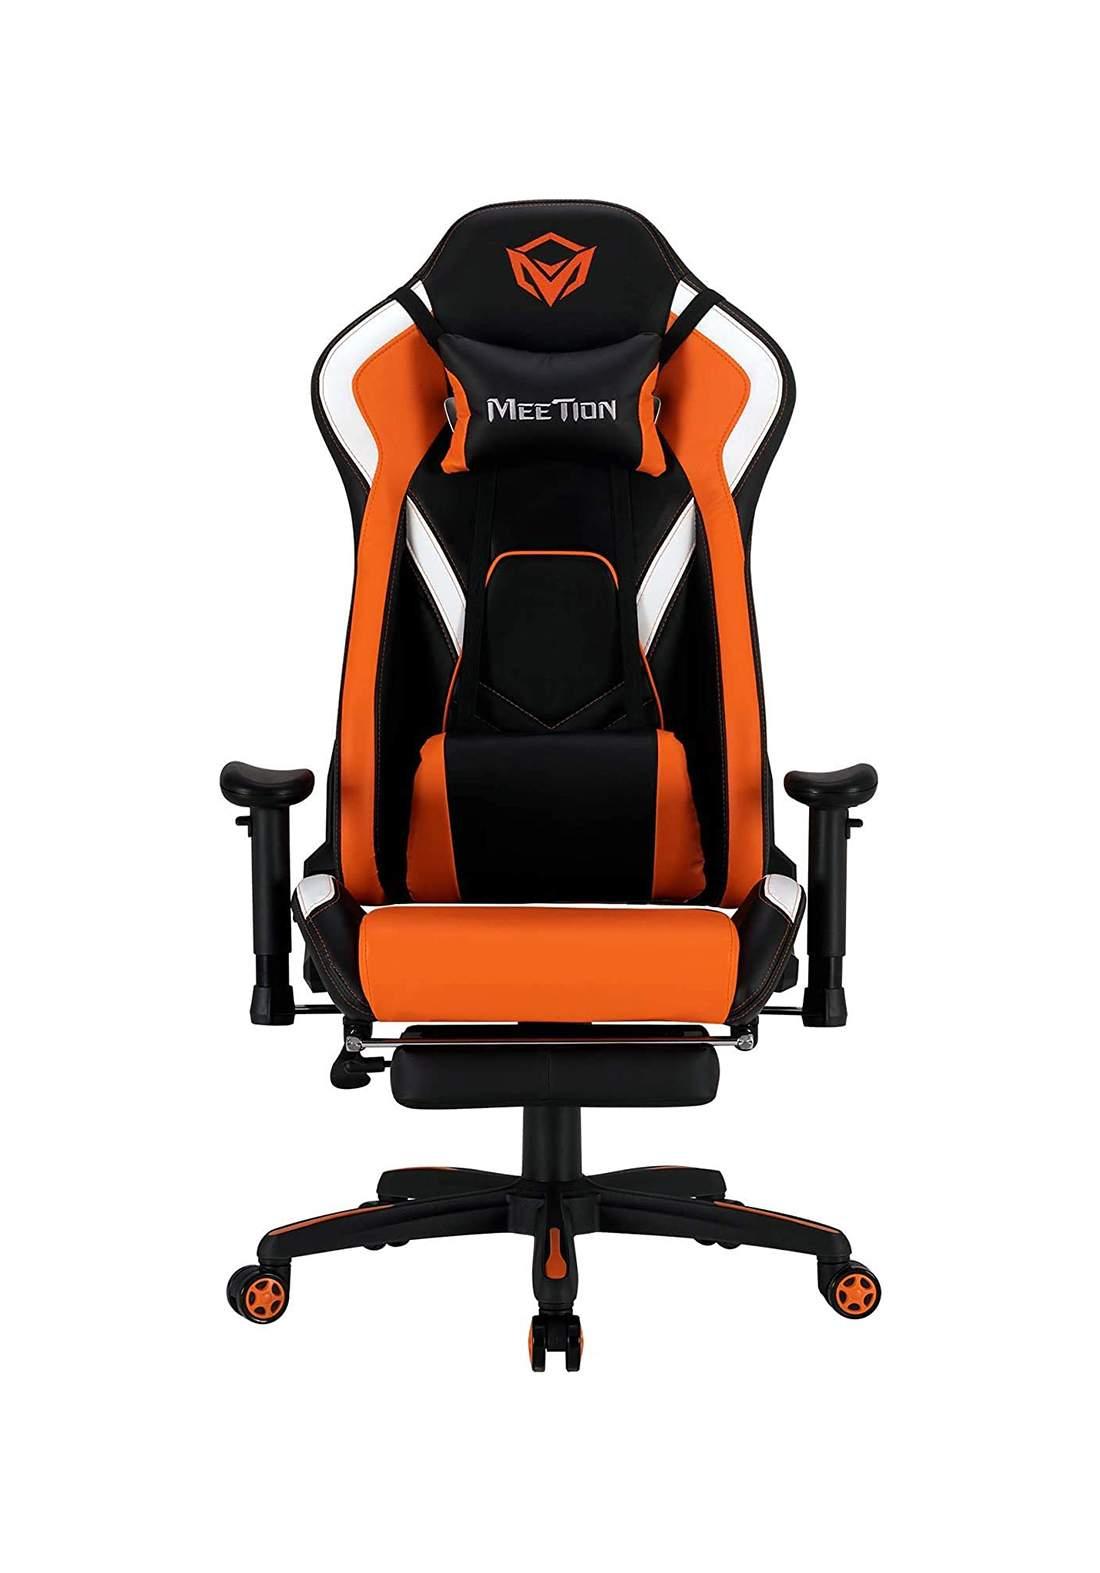 MeeTion MT-CHR22 Gaming Chair with Footrest - Black / Orange كرسي ألعاب ميشن